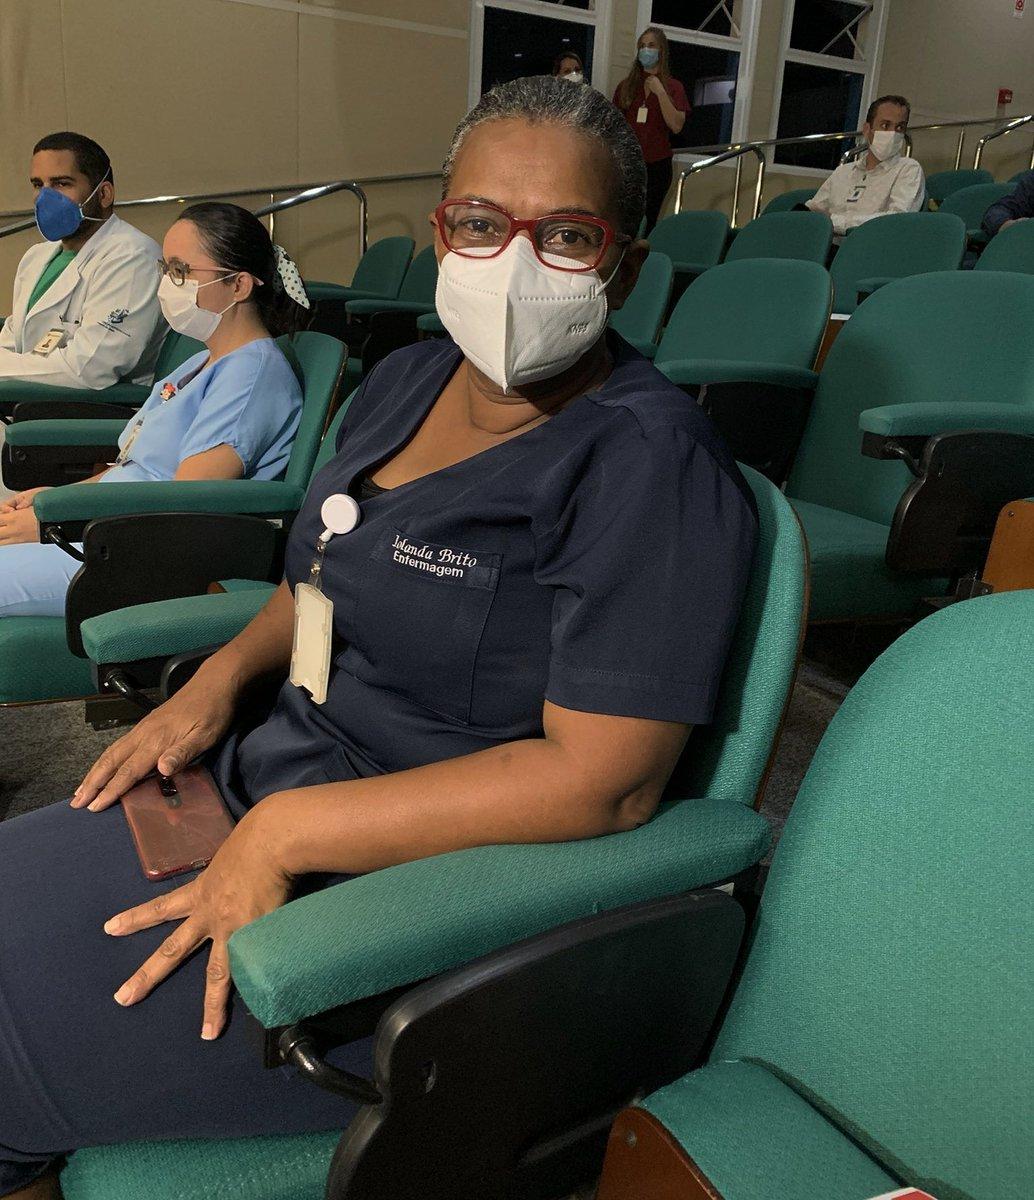 Dona Iolanda, mulher negra e técnica de enfermagem, foi a primeira a ser vacinada contra a #Covid19, no Espírito Santo. Momento histórico registrado por @DanielMarcal_, do Movimento Online! #VacinaJa #VacinaParaTodos